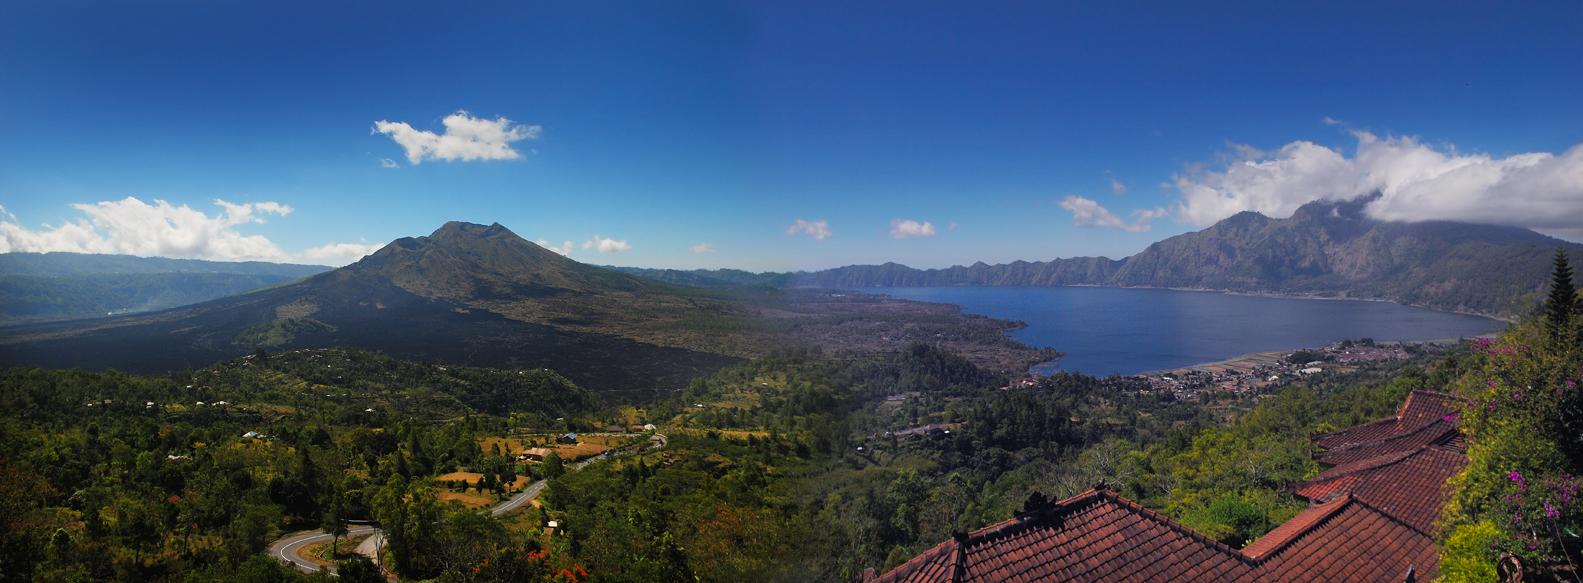 bali volcano - photo #41